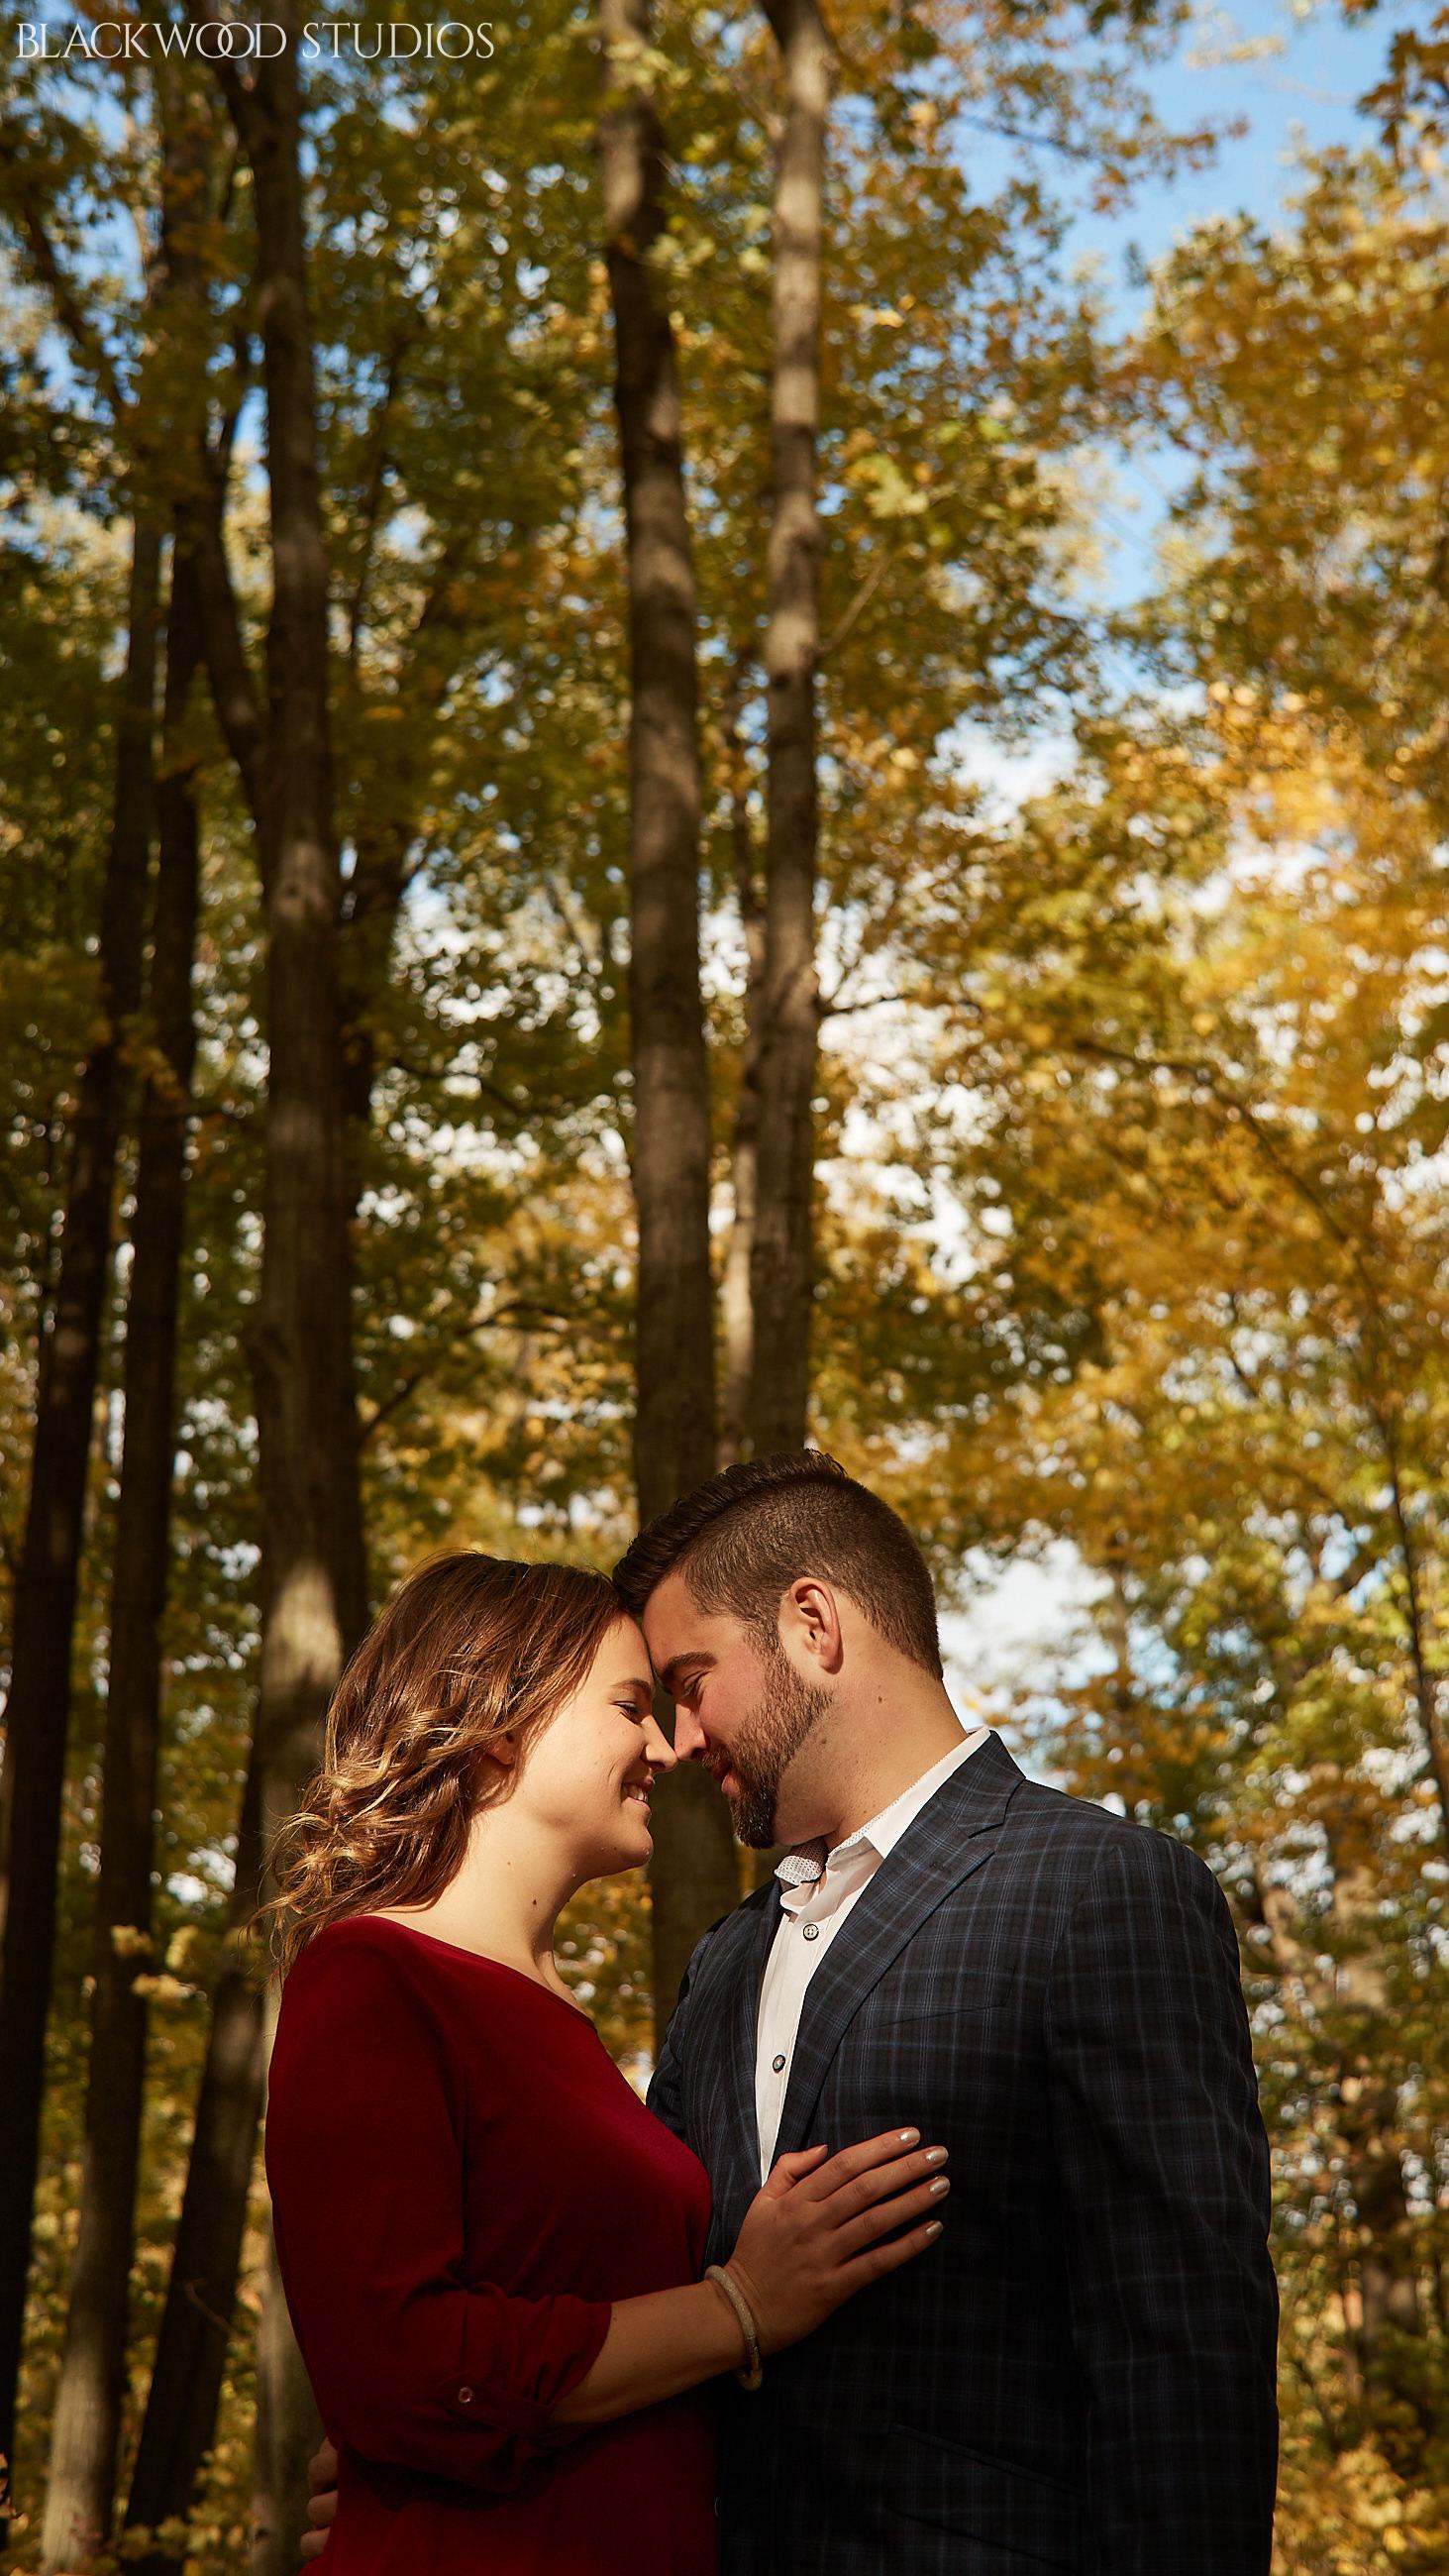 Blackwood-Studios-20181014-160844-Dave-and-Natalie-Engagement-0505-Rattlesnake-Point-Conservation-Area-Milton-Ontario.jpg